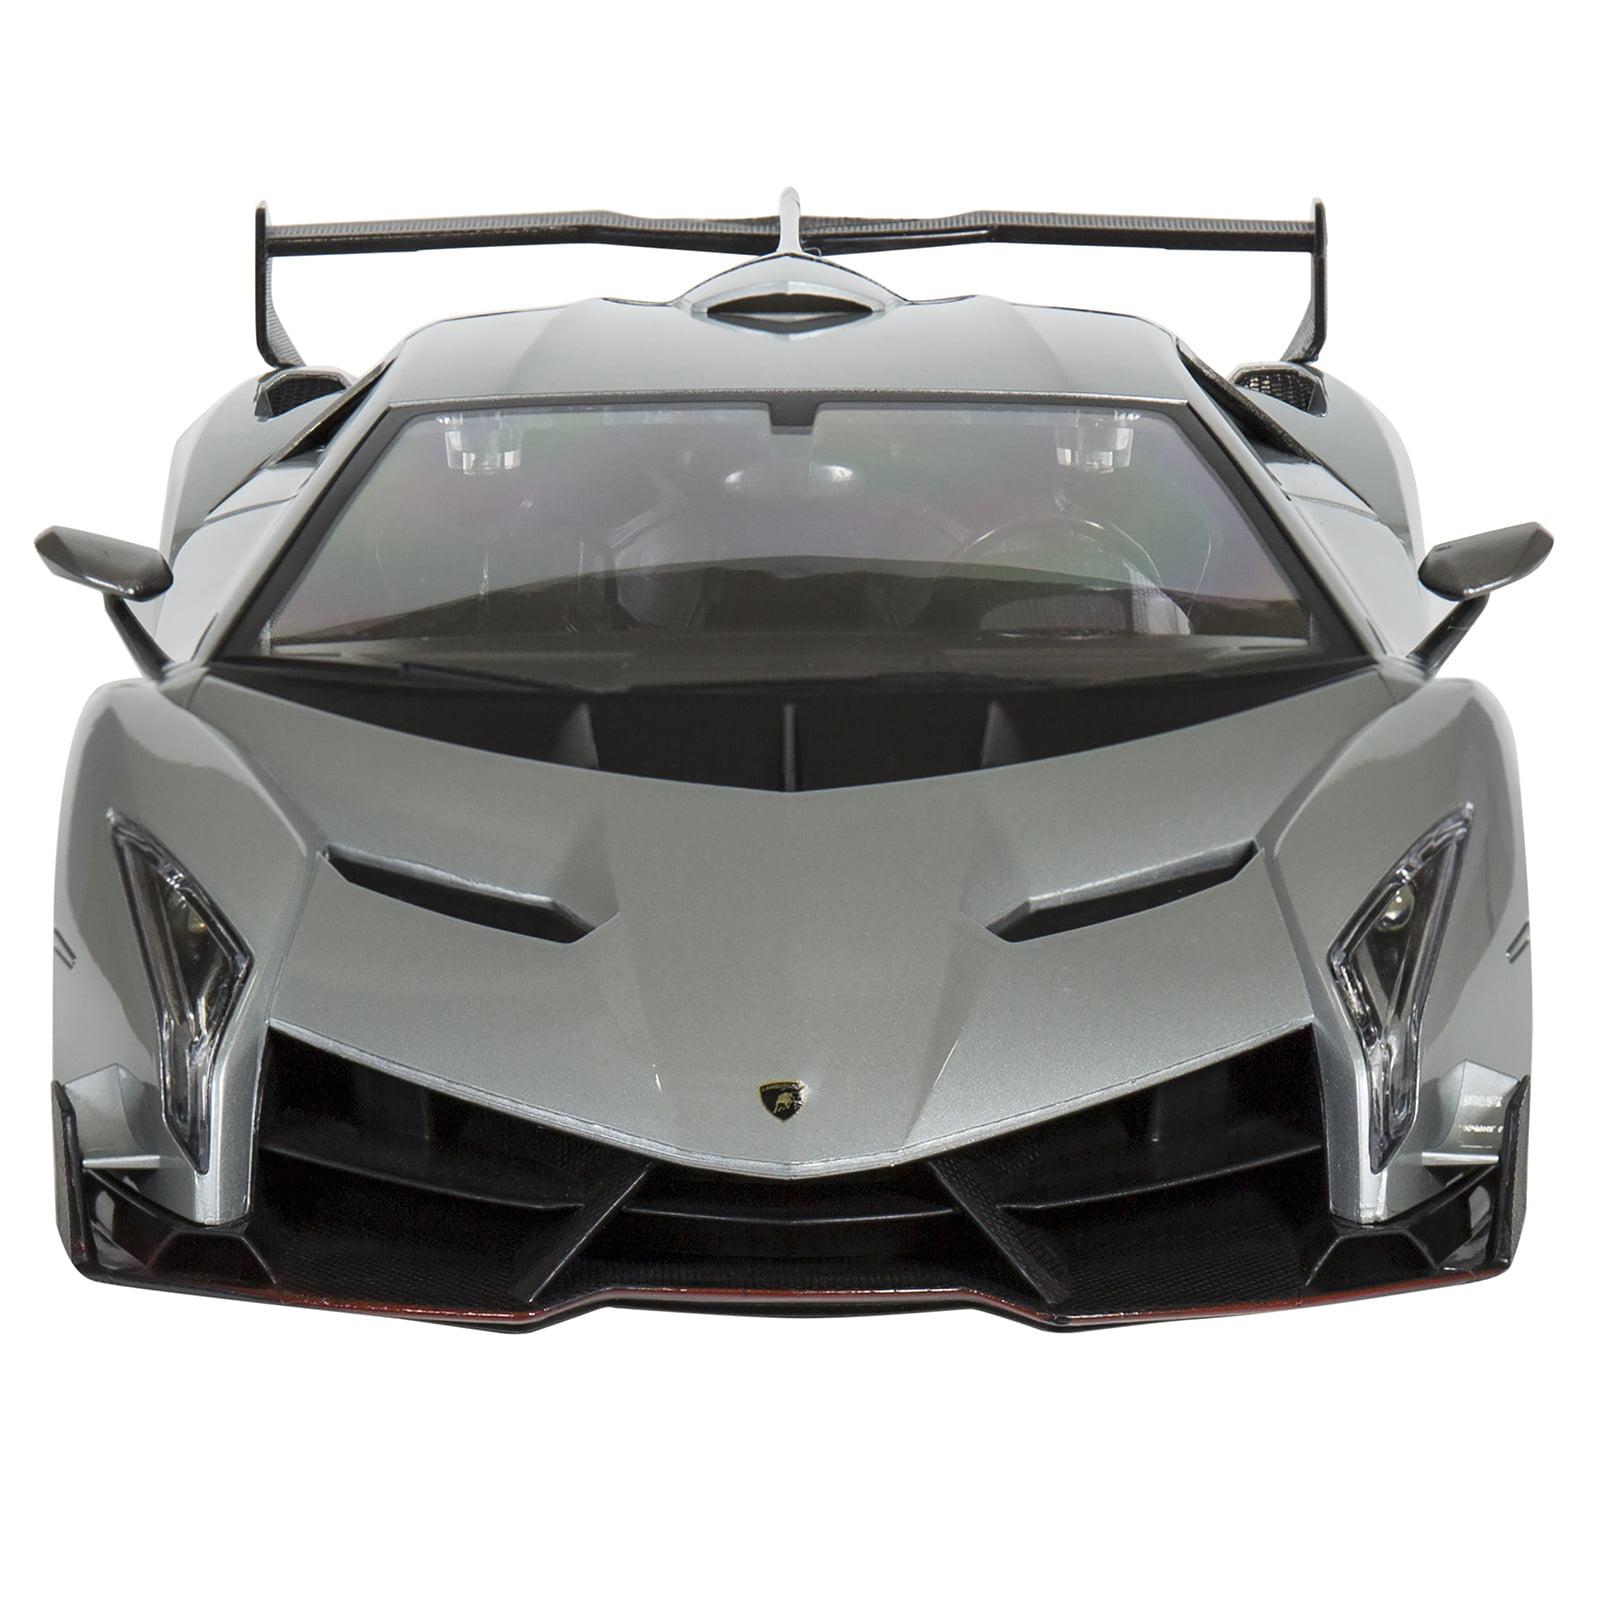 Best Choice Products 1 14 Scale Remote Control Car Lamborghini